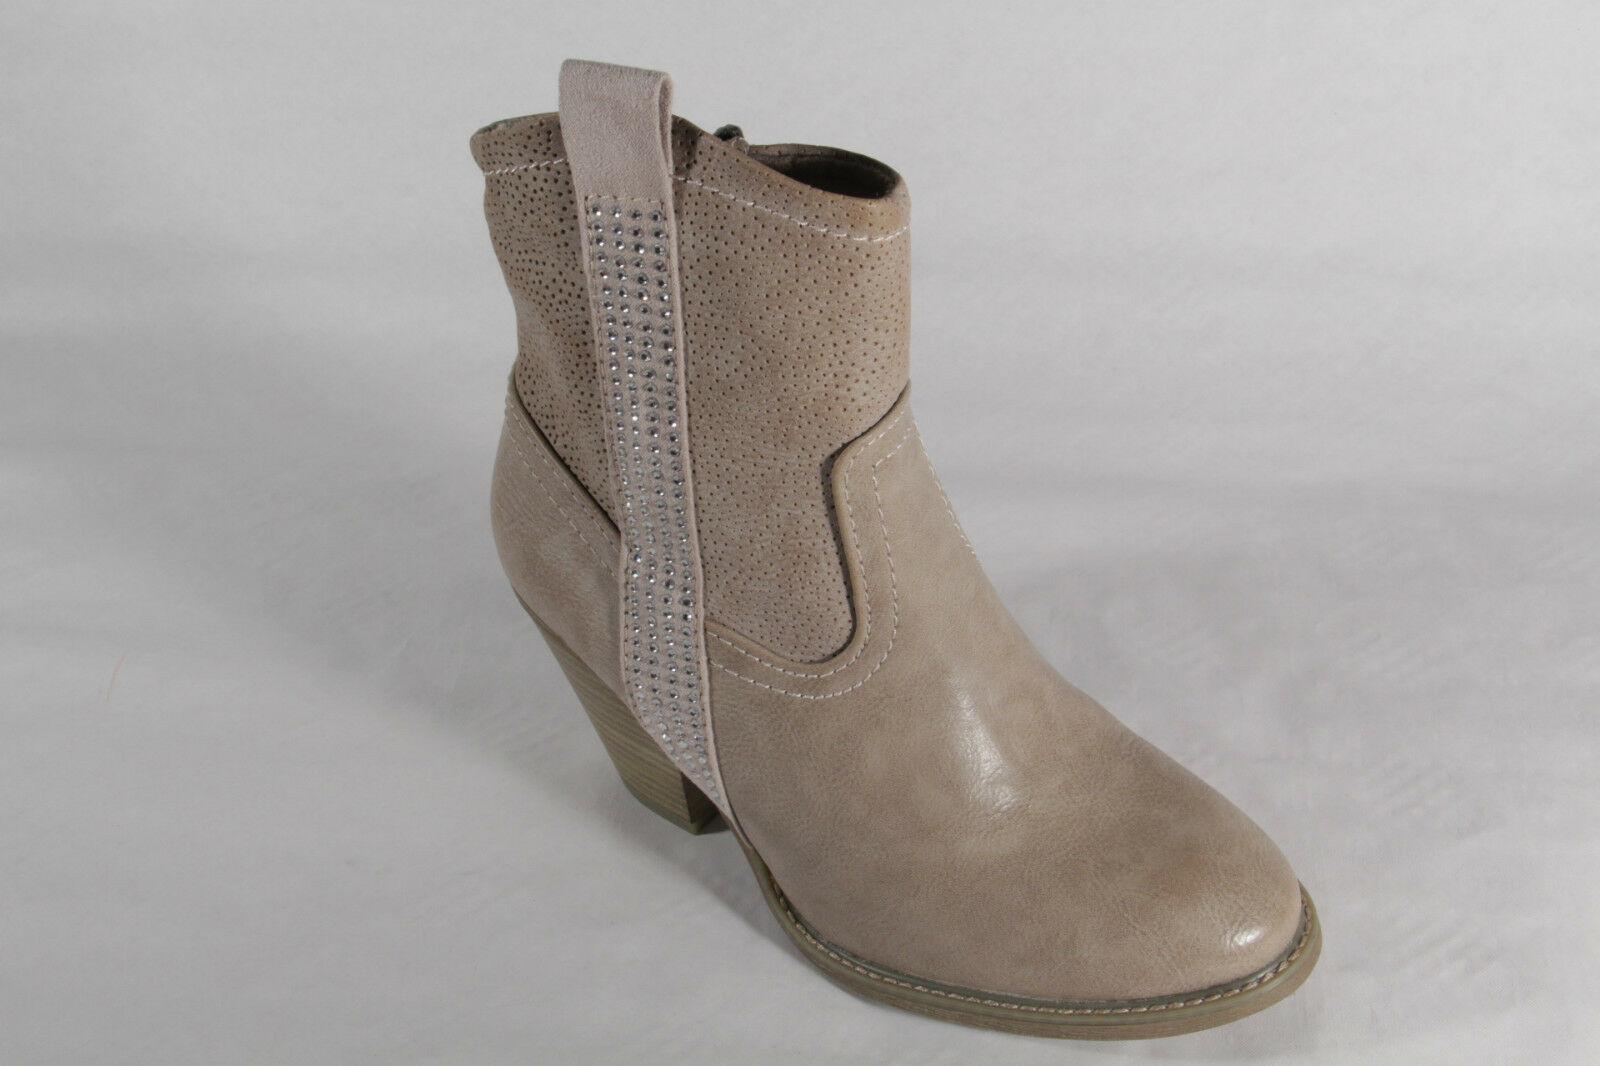 Marco Tozzi Stiefel, Stiefeletten, Stiefel Kunstleder beige, Reißverschluss NEU    611b07